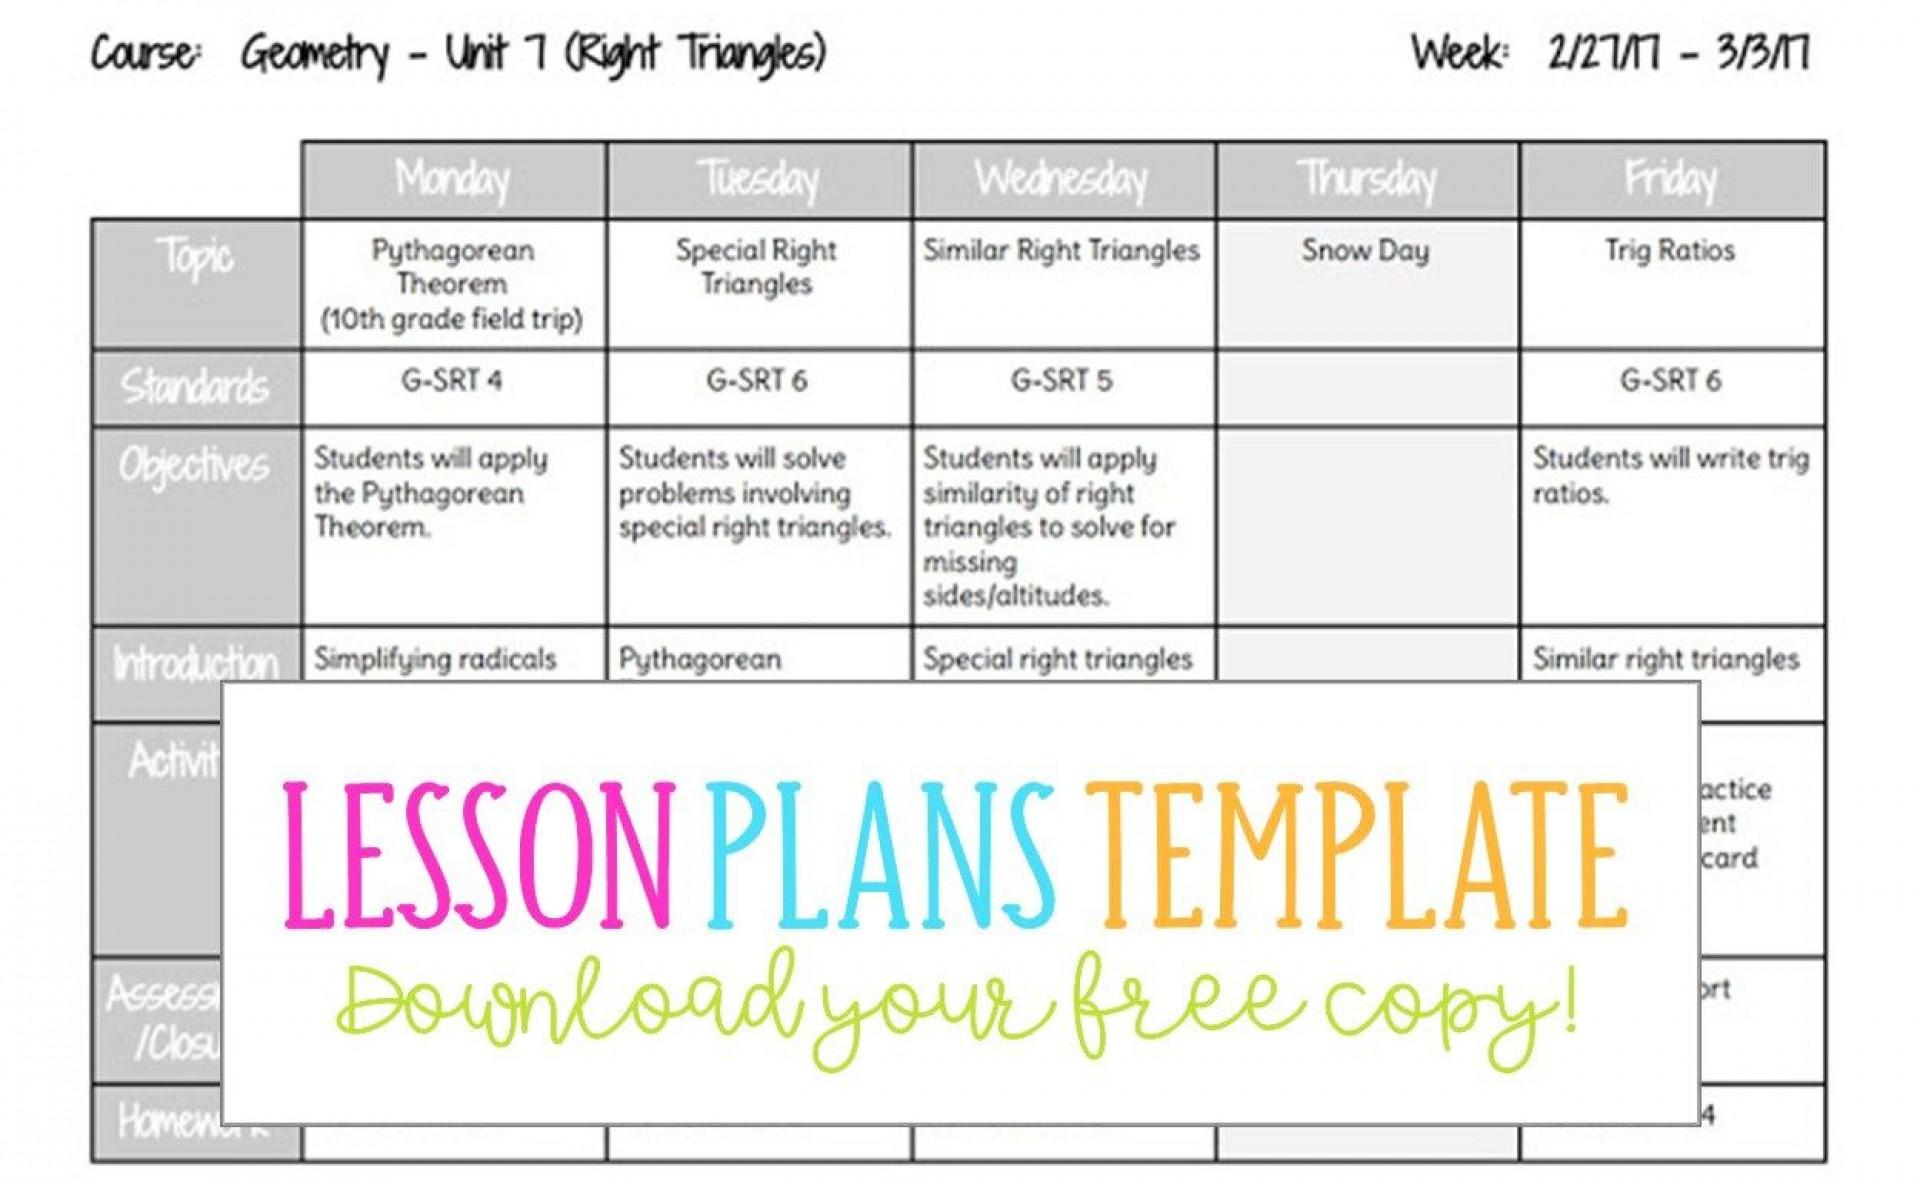 006 Stupendou Lesson Plan Template Google Doc Picture  Docs Danielson Siop High School1920